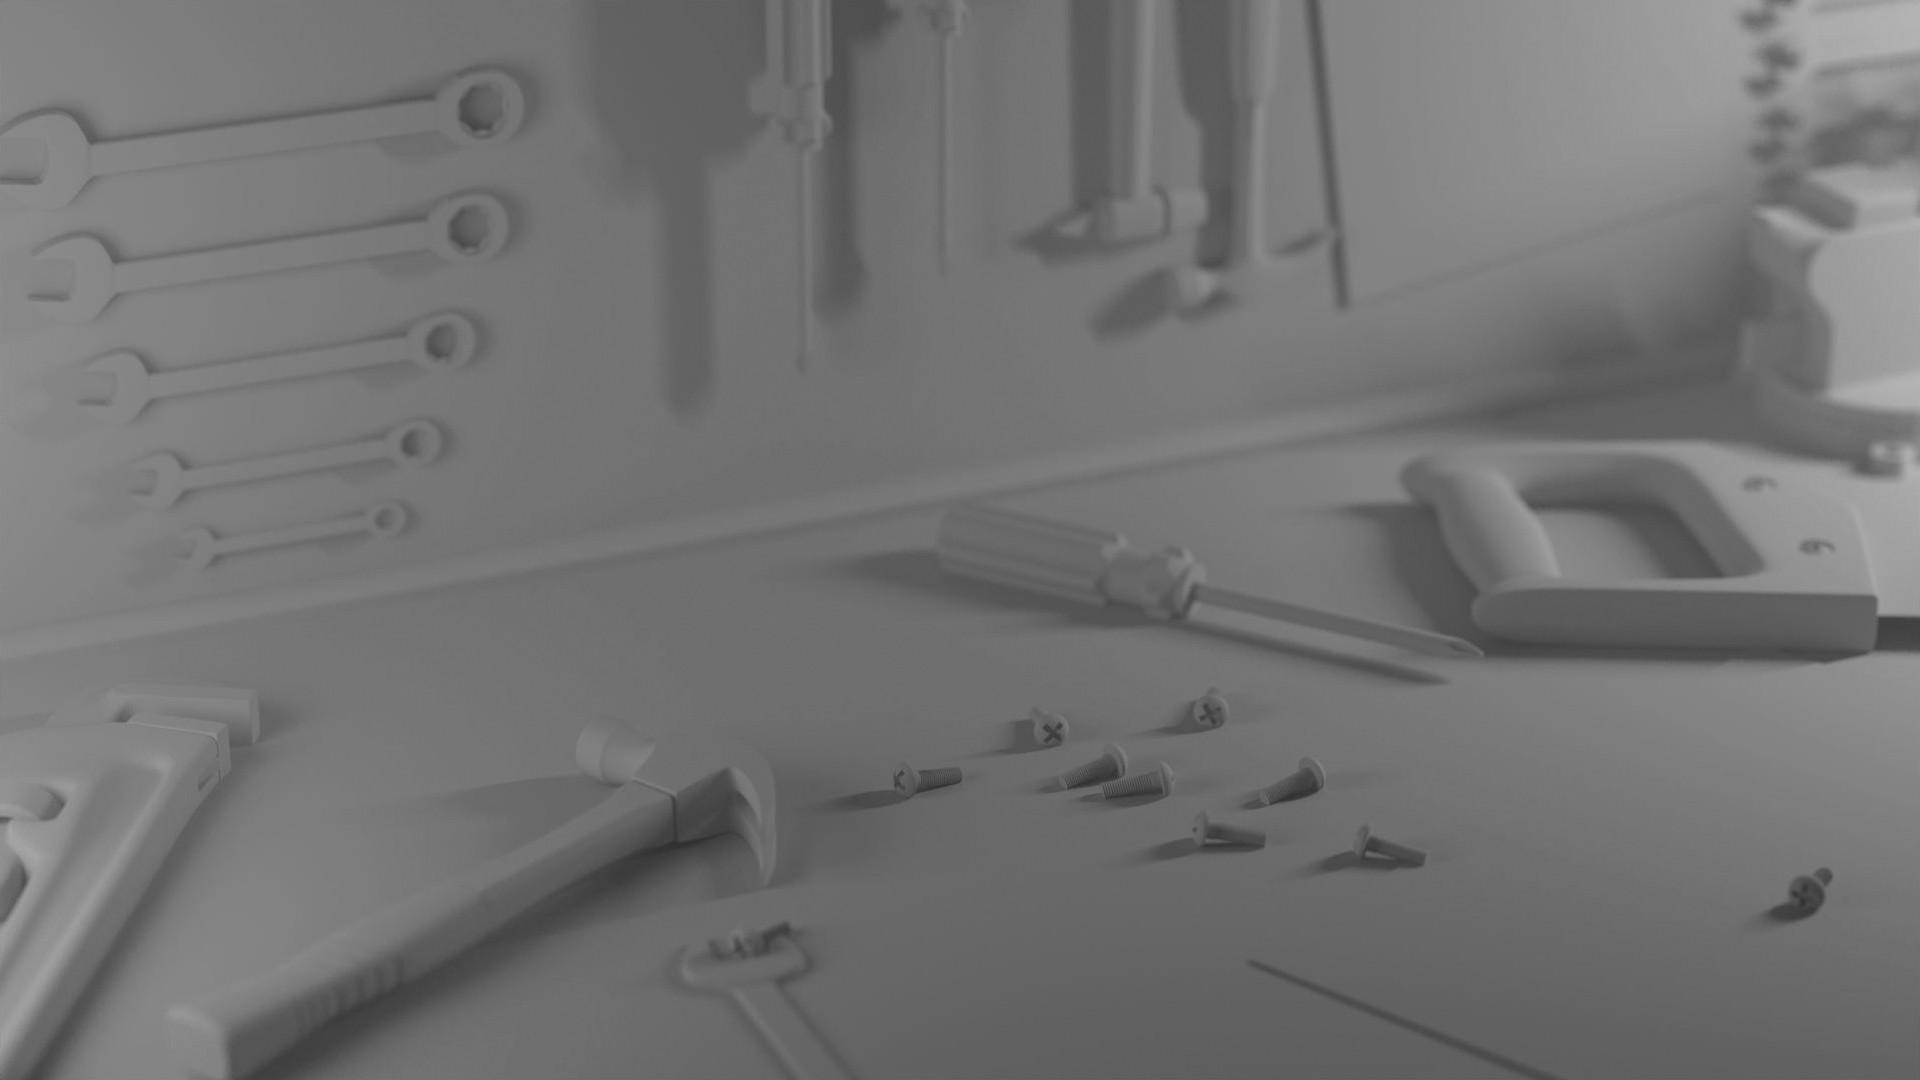 Michelangelo girardi tool bench